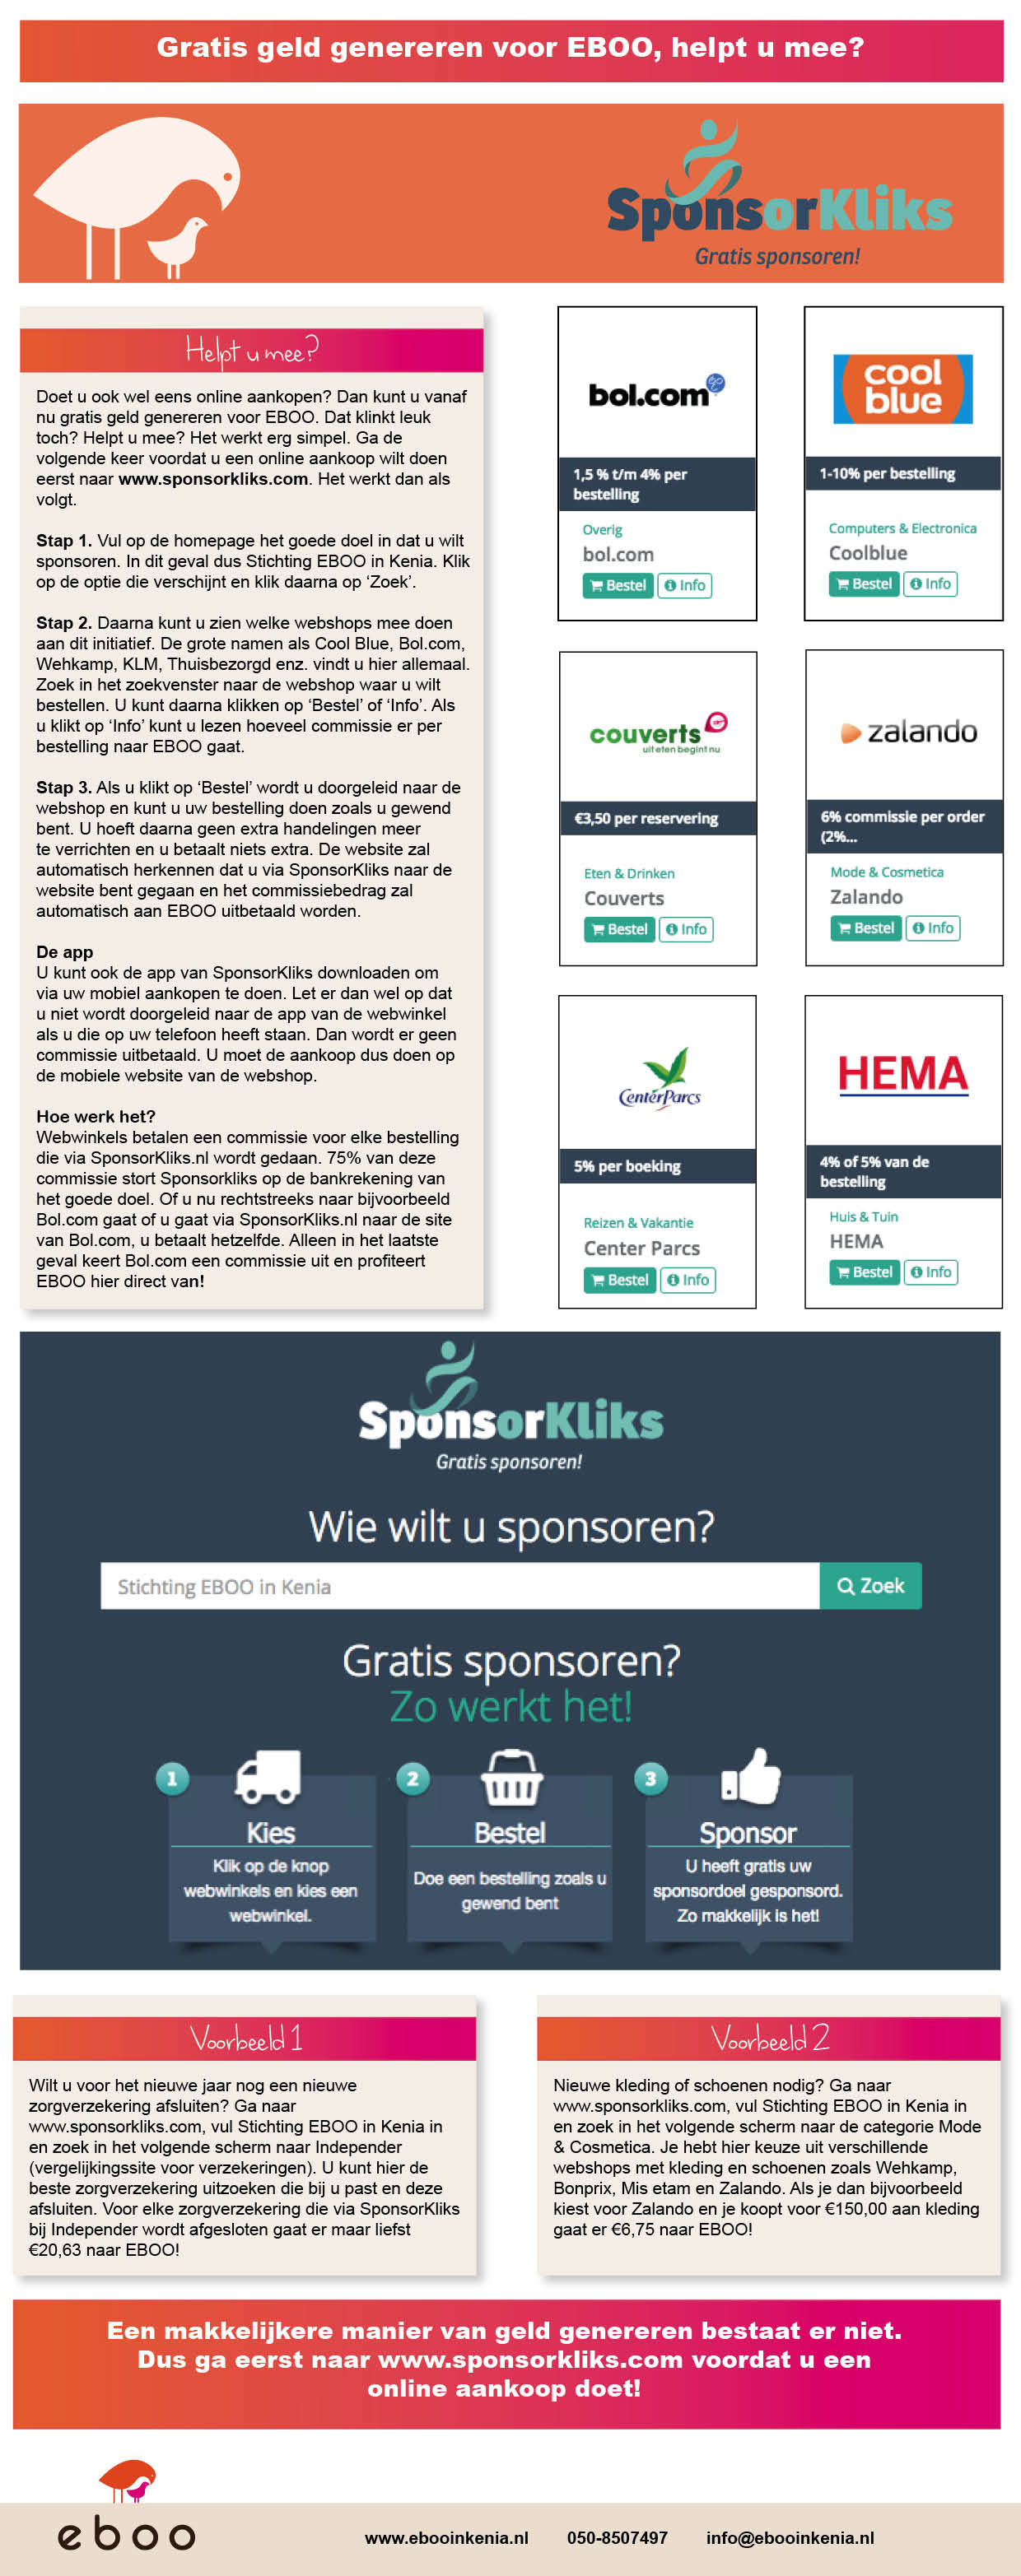 nieuwsbrief_sponsorkliks